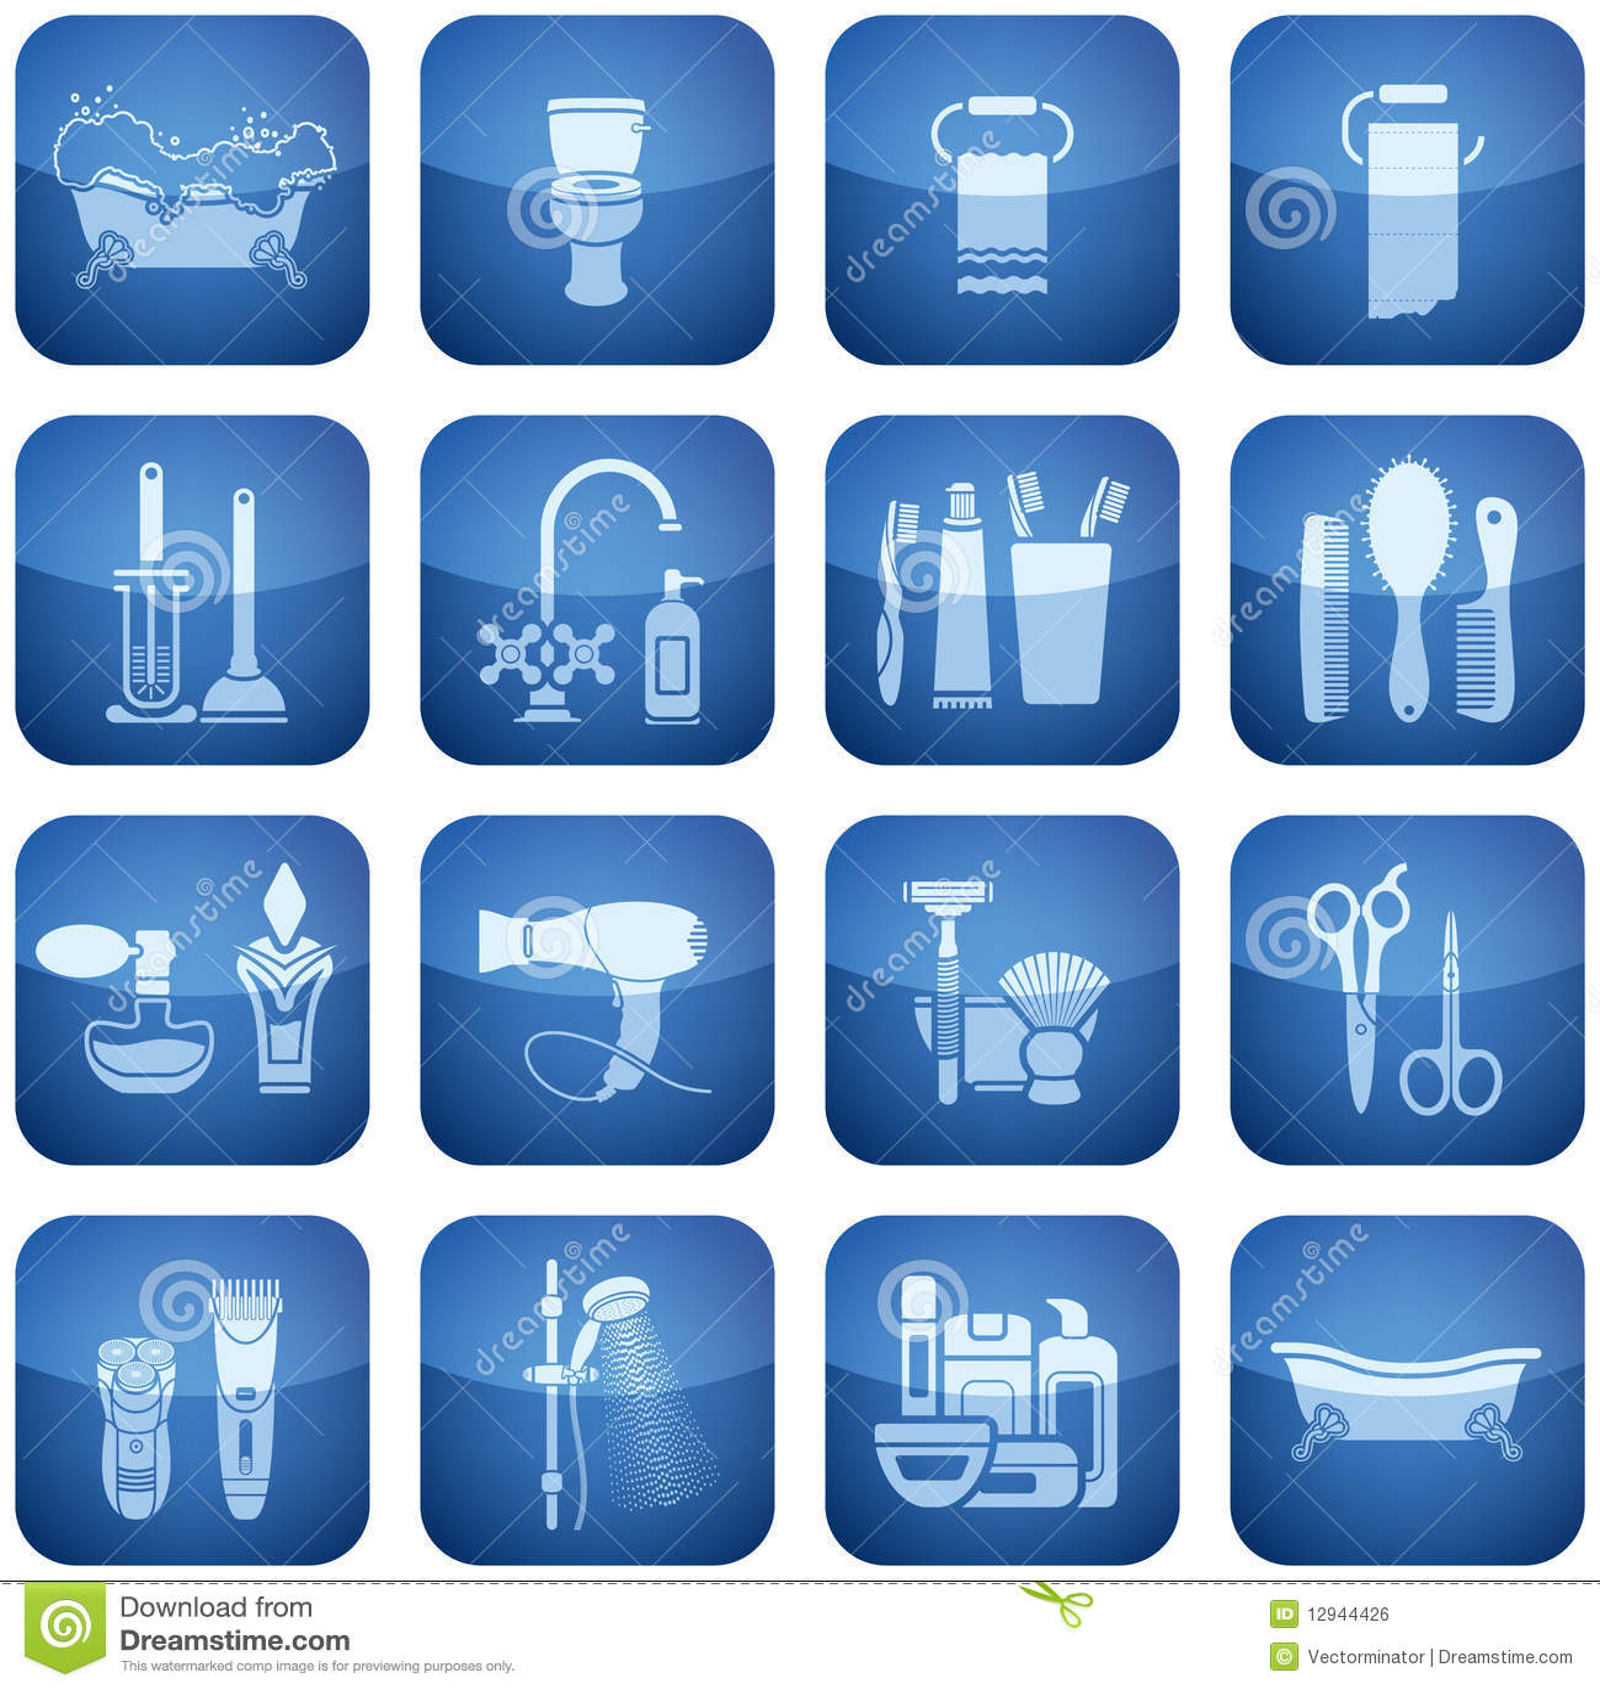 Cobalt Square 2d Icons Set Bath Royalty Free Stock Image Image 12944426